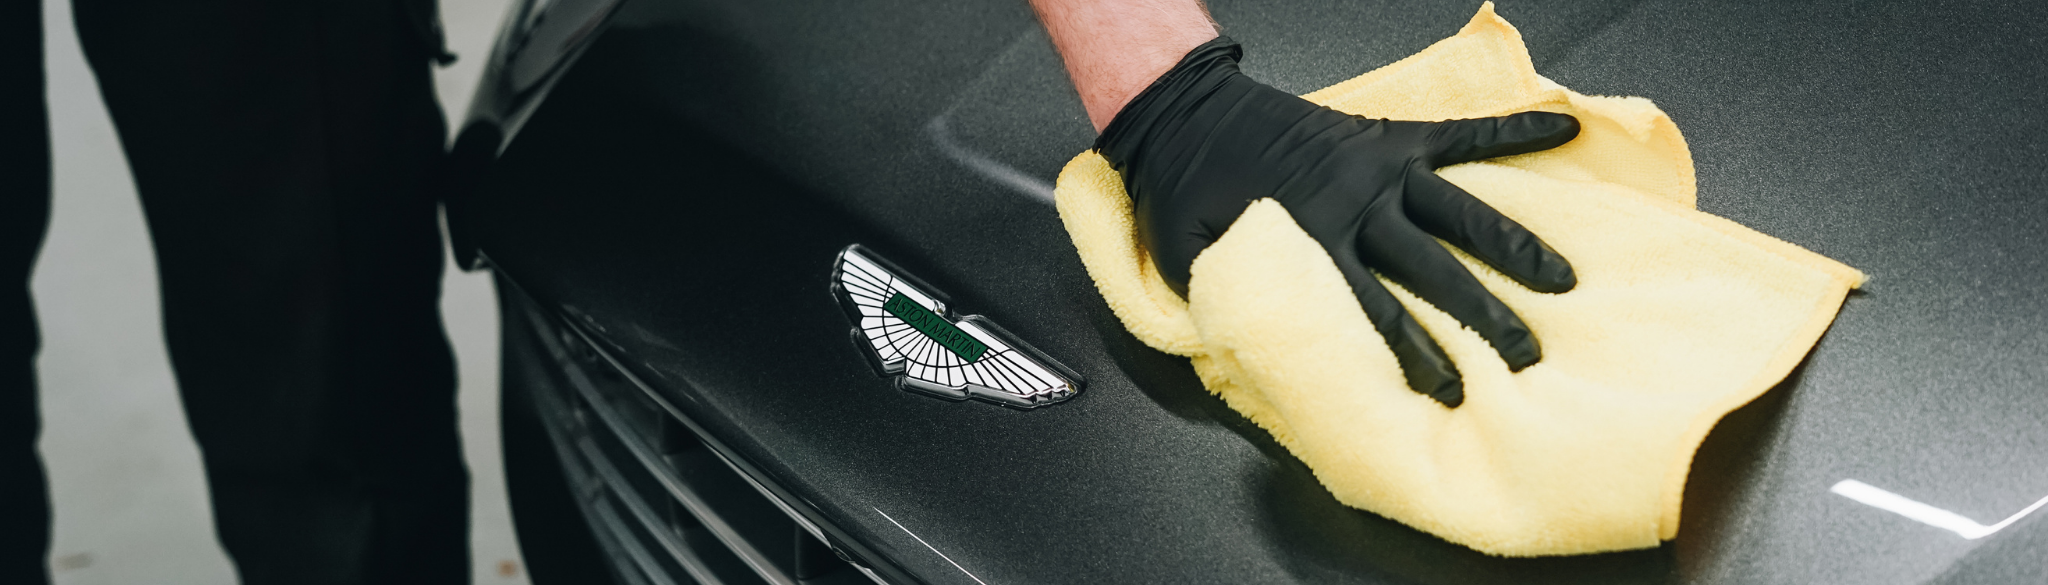 Aston Martin Clean